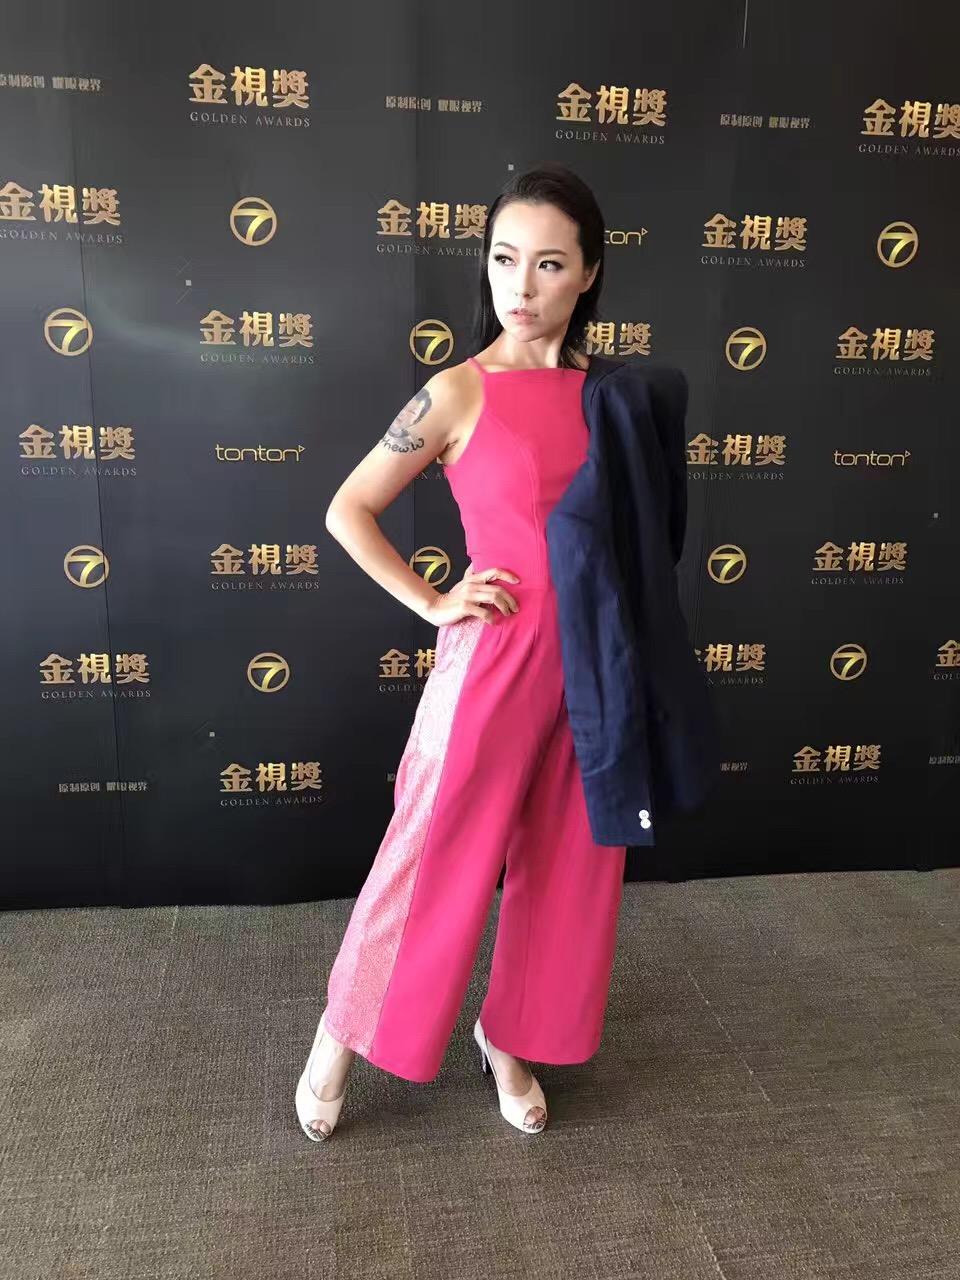 Mandy Chen at Golden Awards 2017